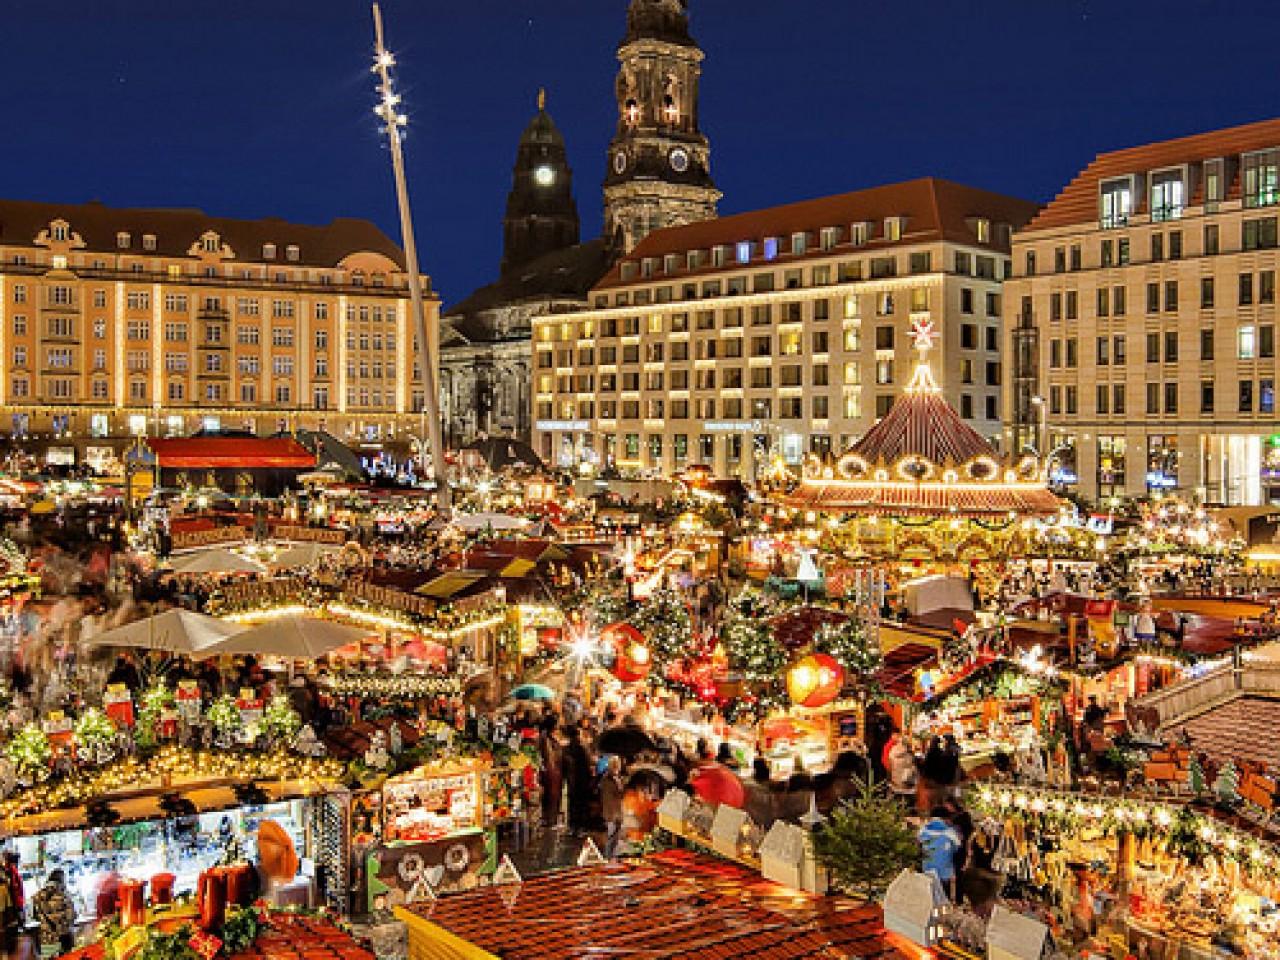 Budapest at Christmas: 03 December 2021